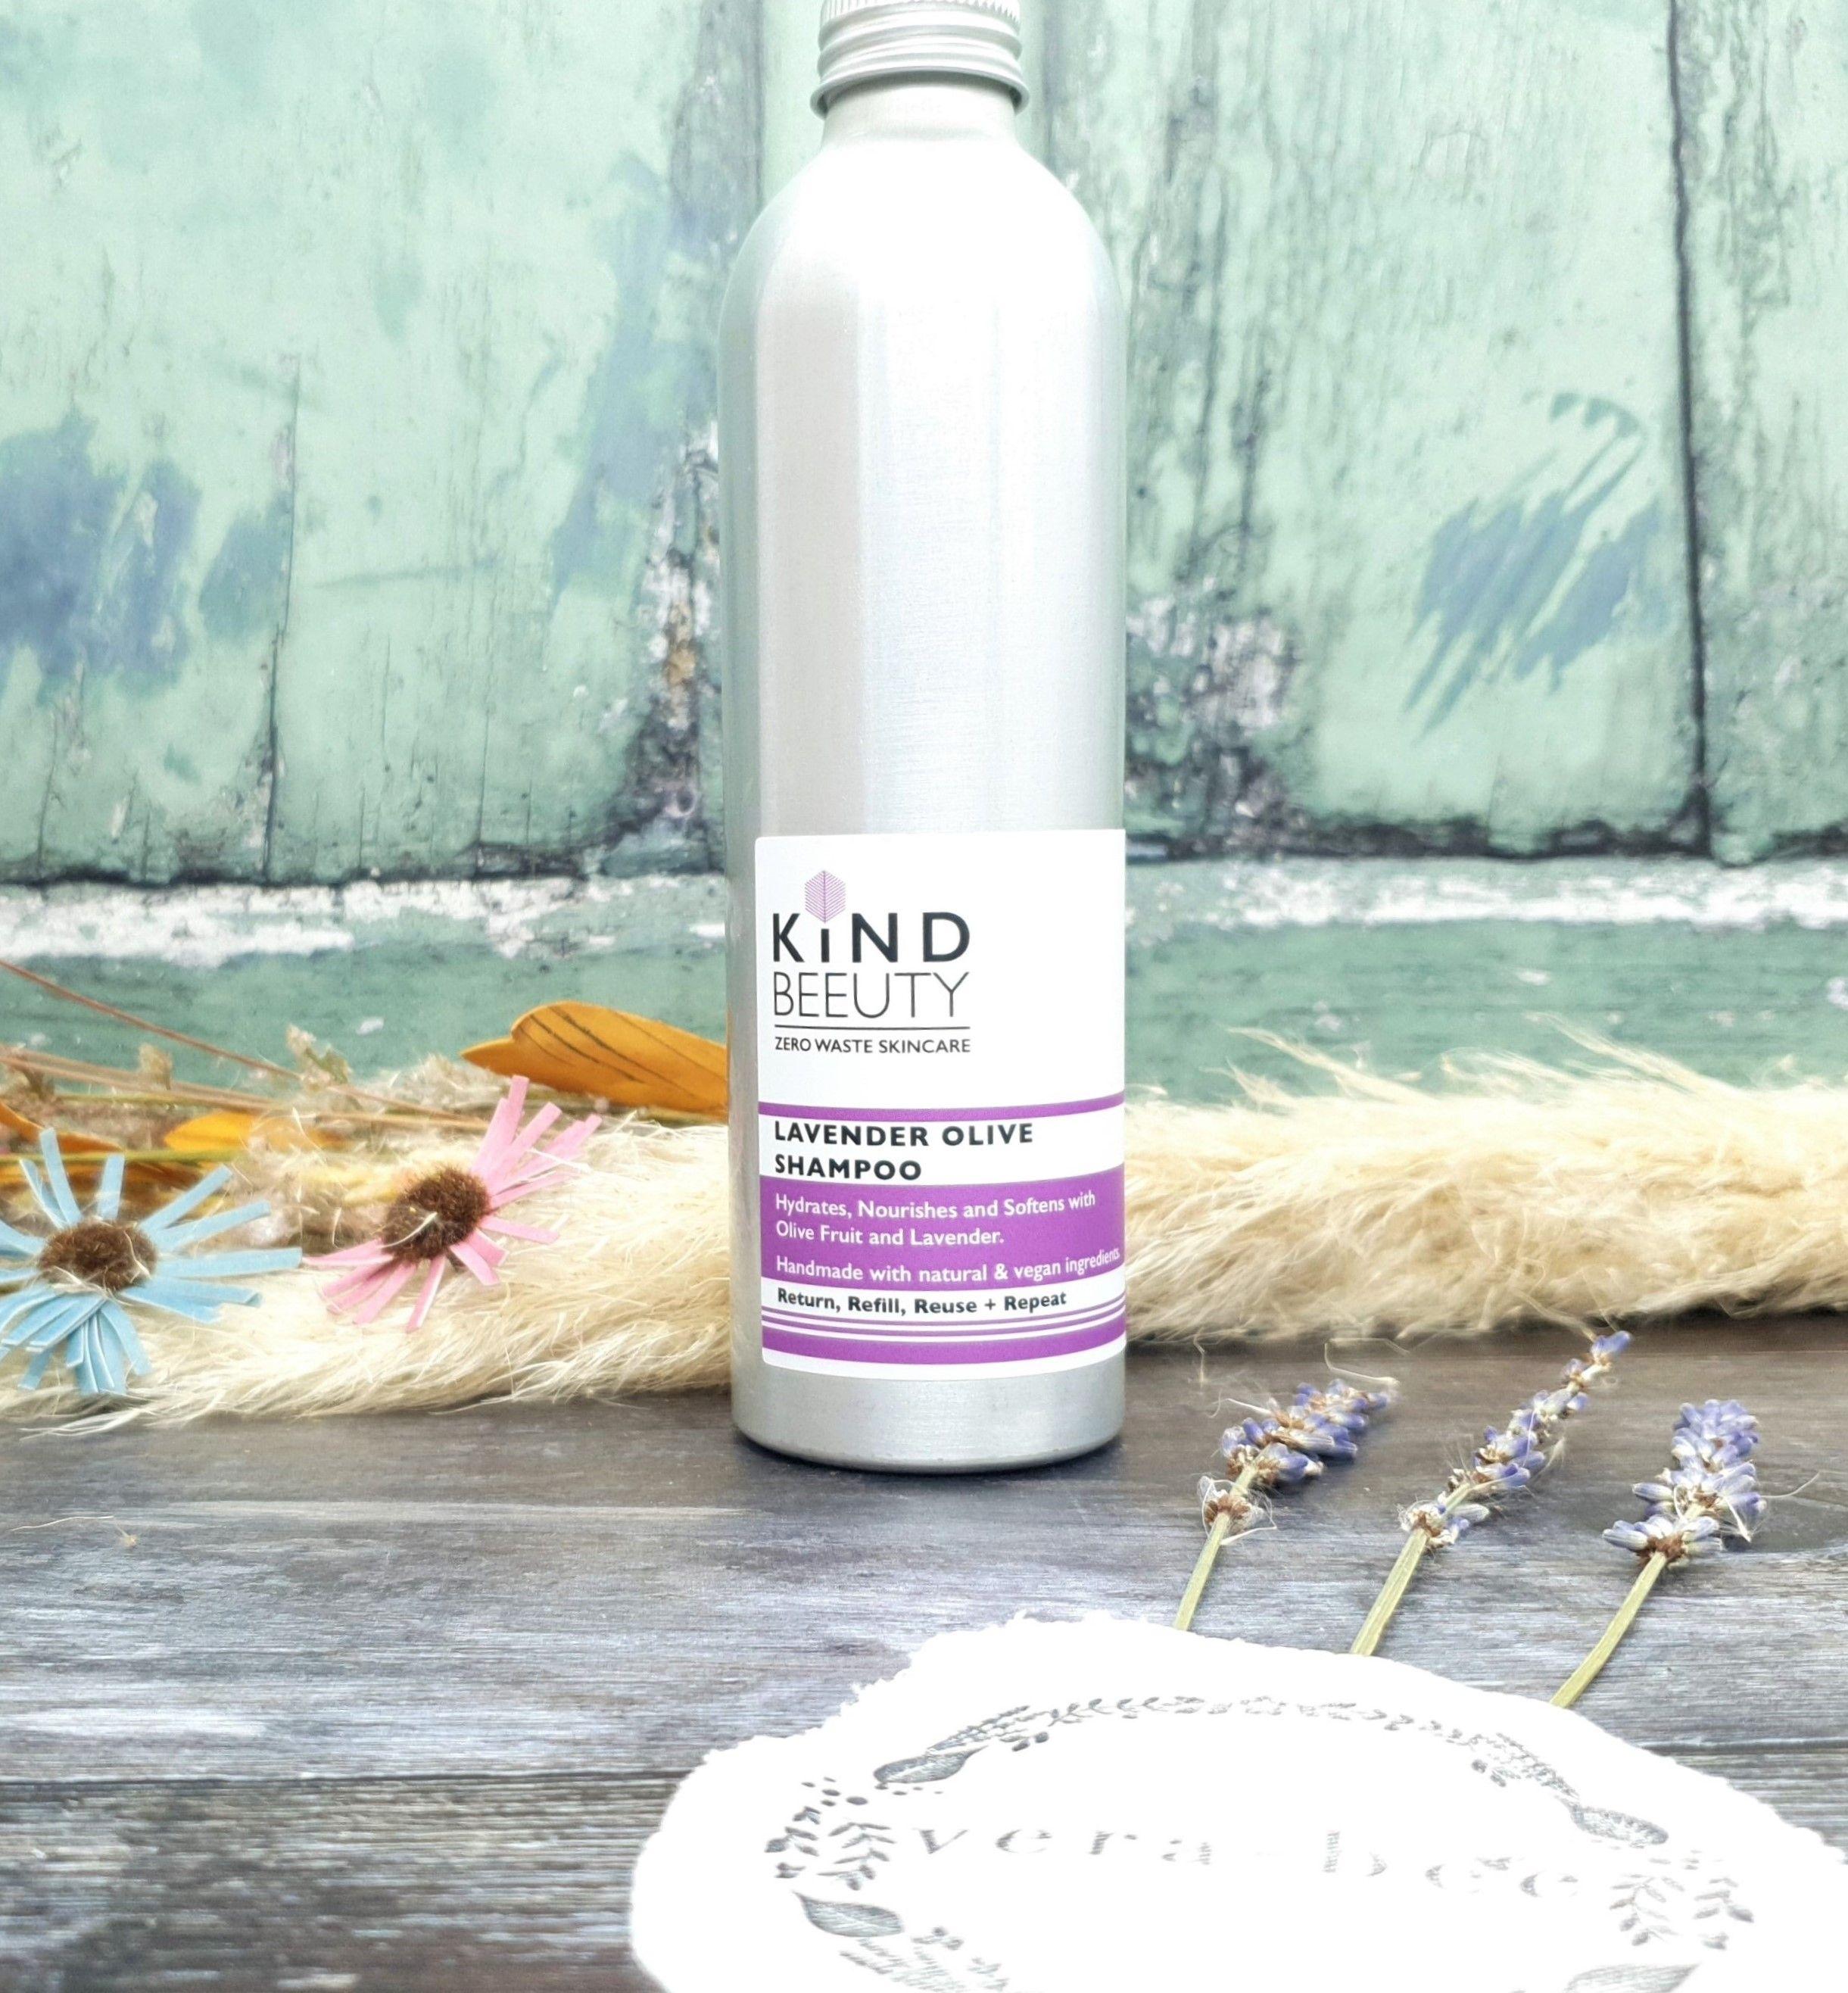 Lavender Olive Shampoo Natural Zero Waste Kind Beeuty